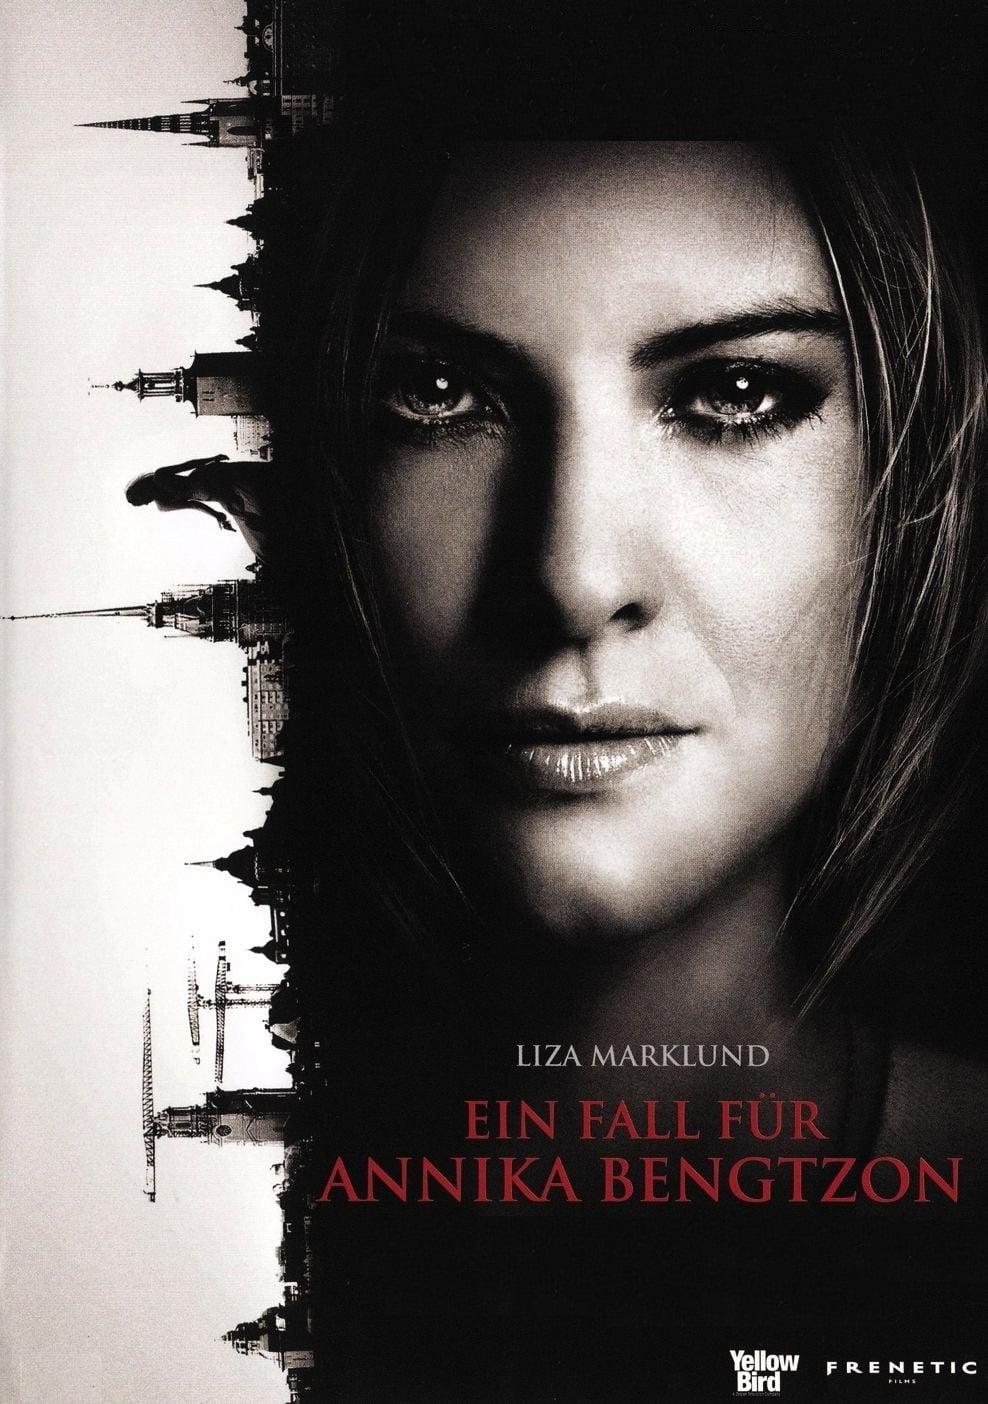 Liza Marklund's Annika Bengtzon